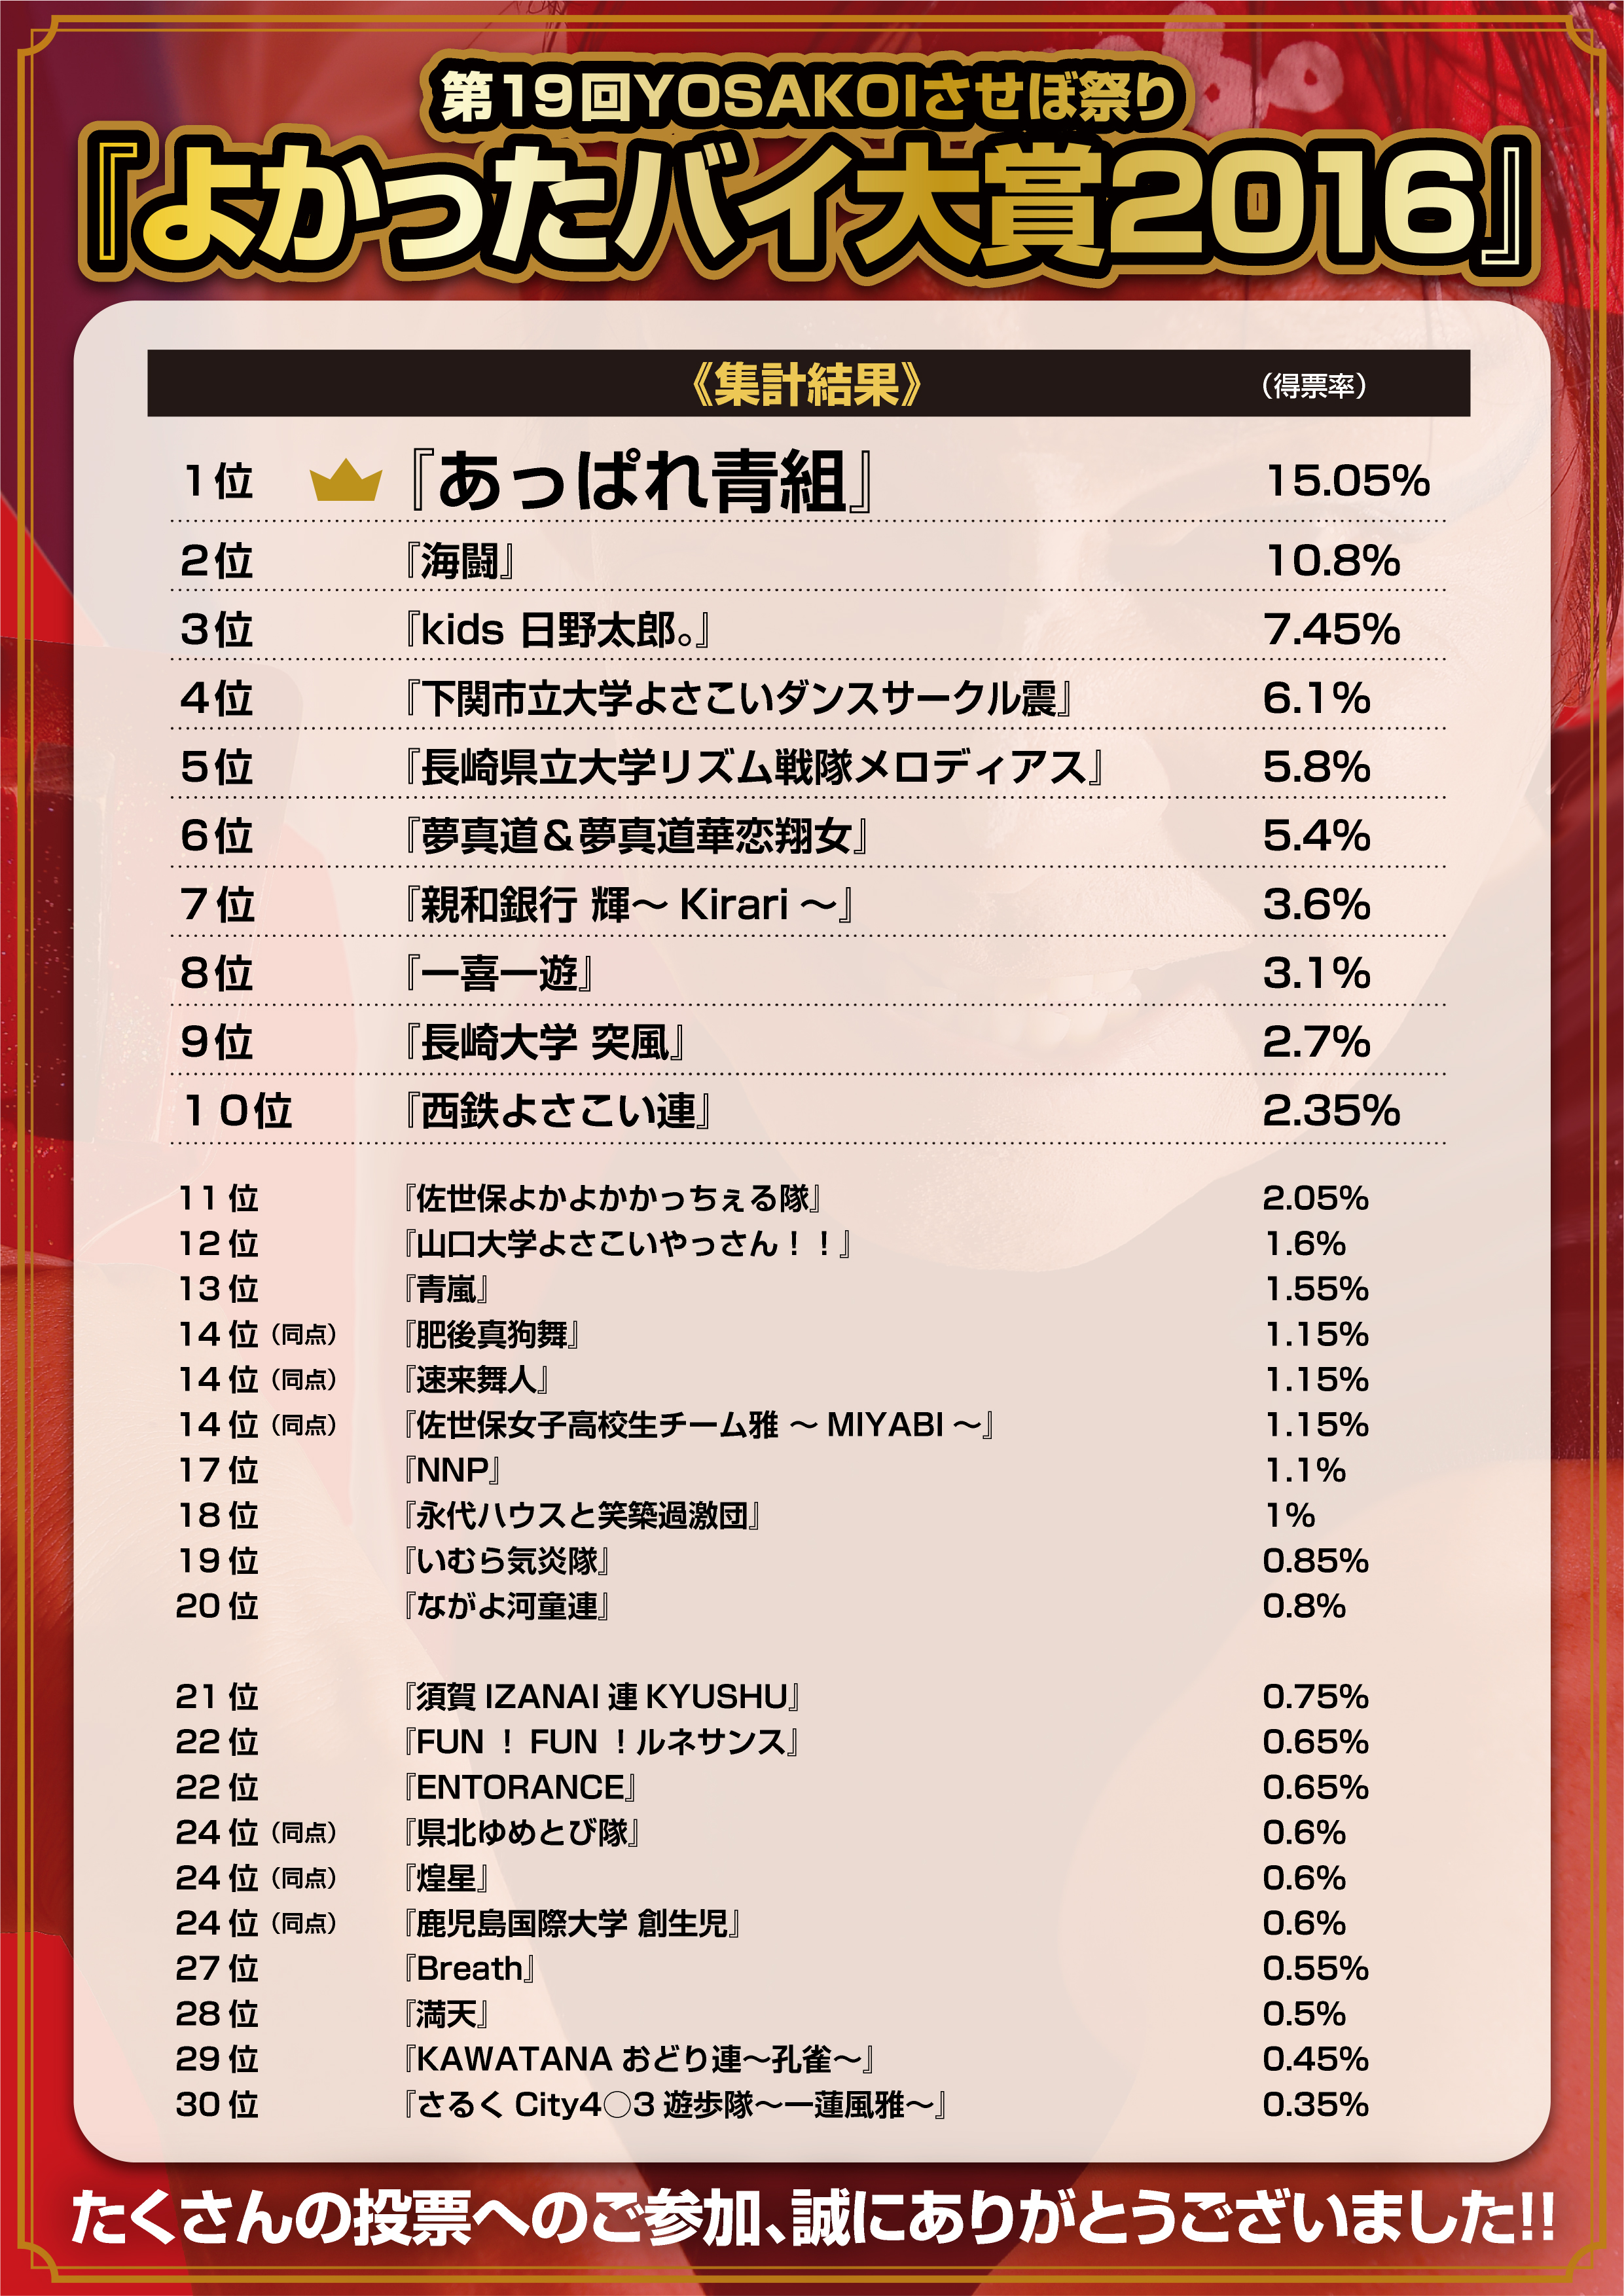 %e3%82%88%e3%81%8b%e3%81%a3%e3%81%9f%e3%83%90%e3%82%a4%e5%a4%a7%e8%b3%9e2016_%e9%9b%86%e8%a8%88%e7%b5%90%e6%9e%9c